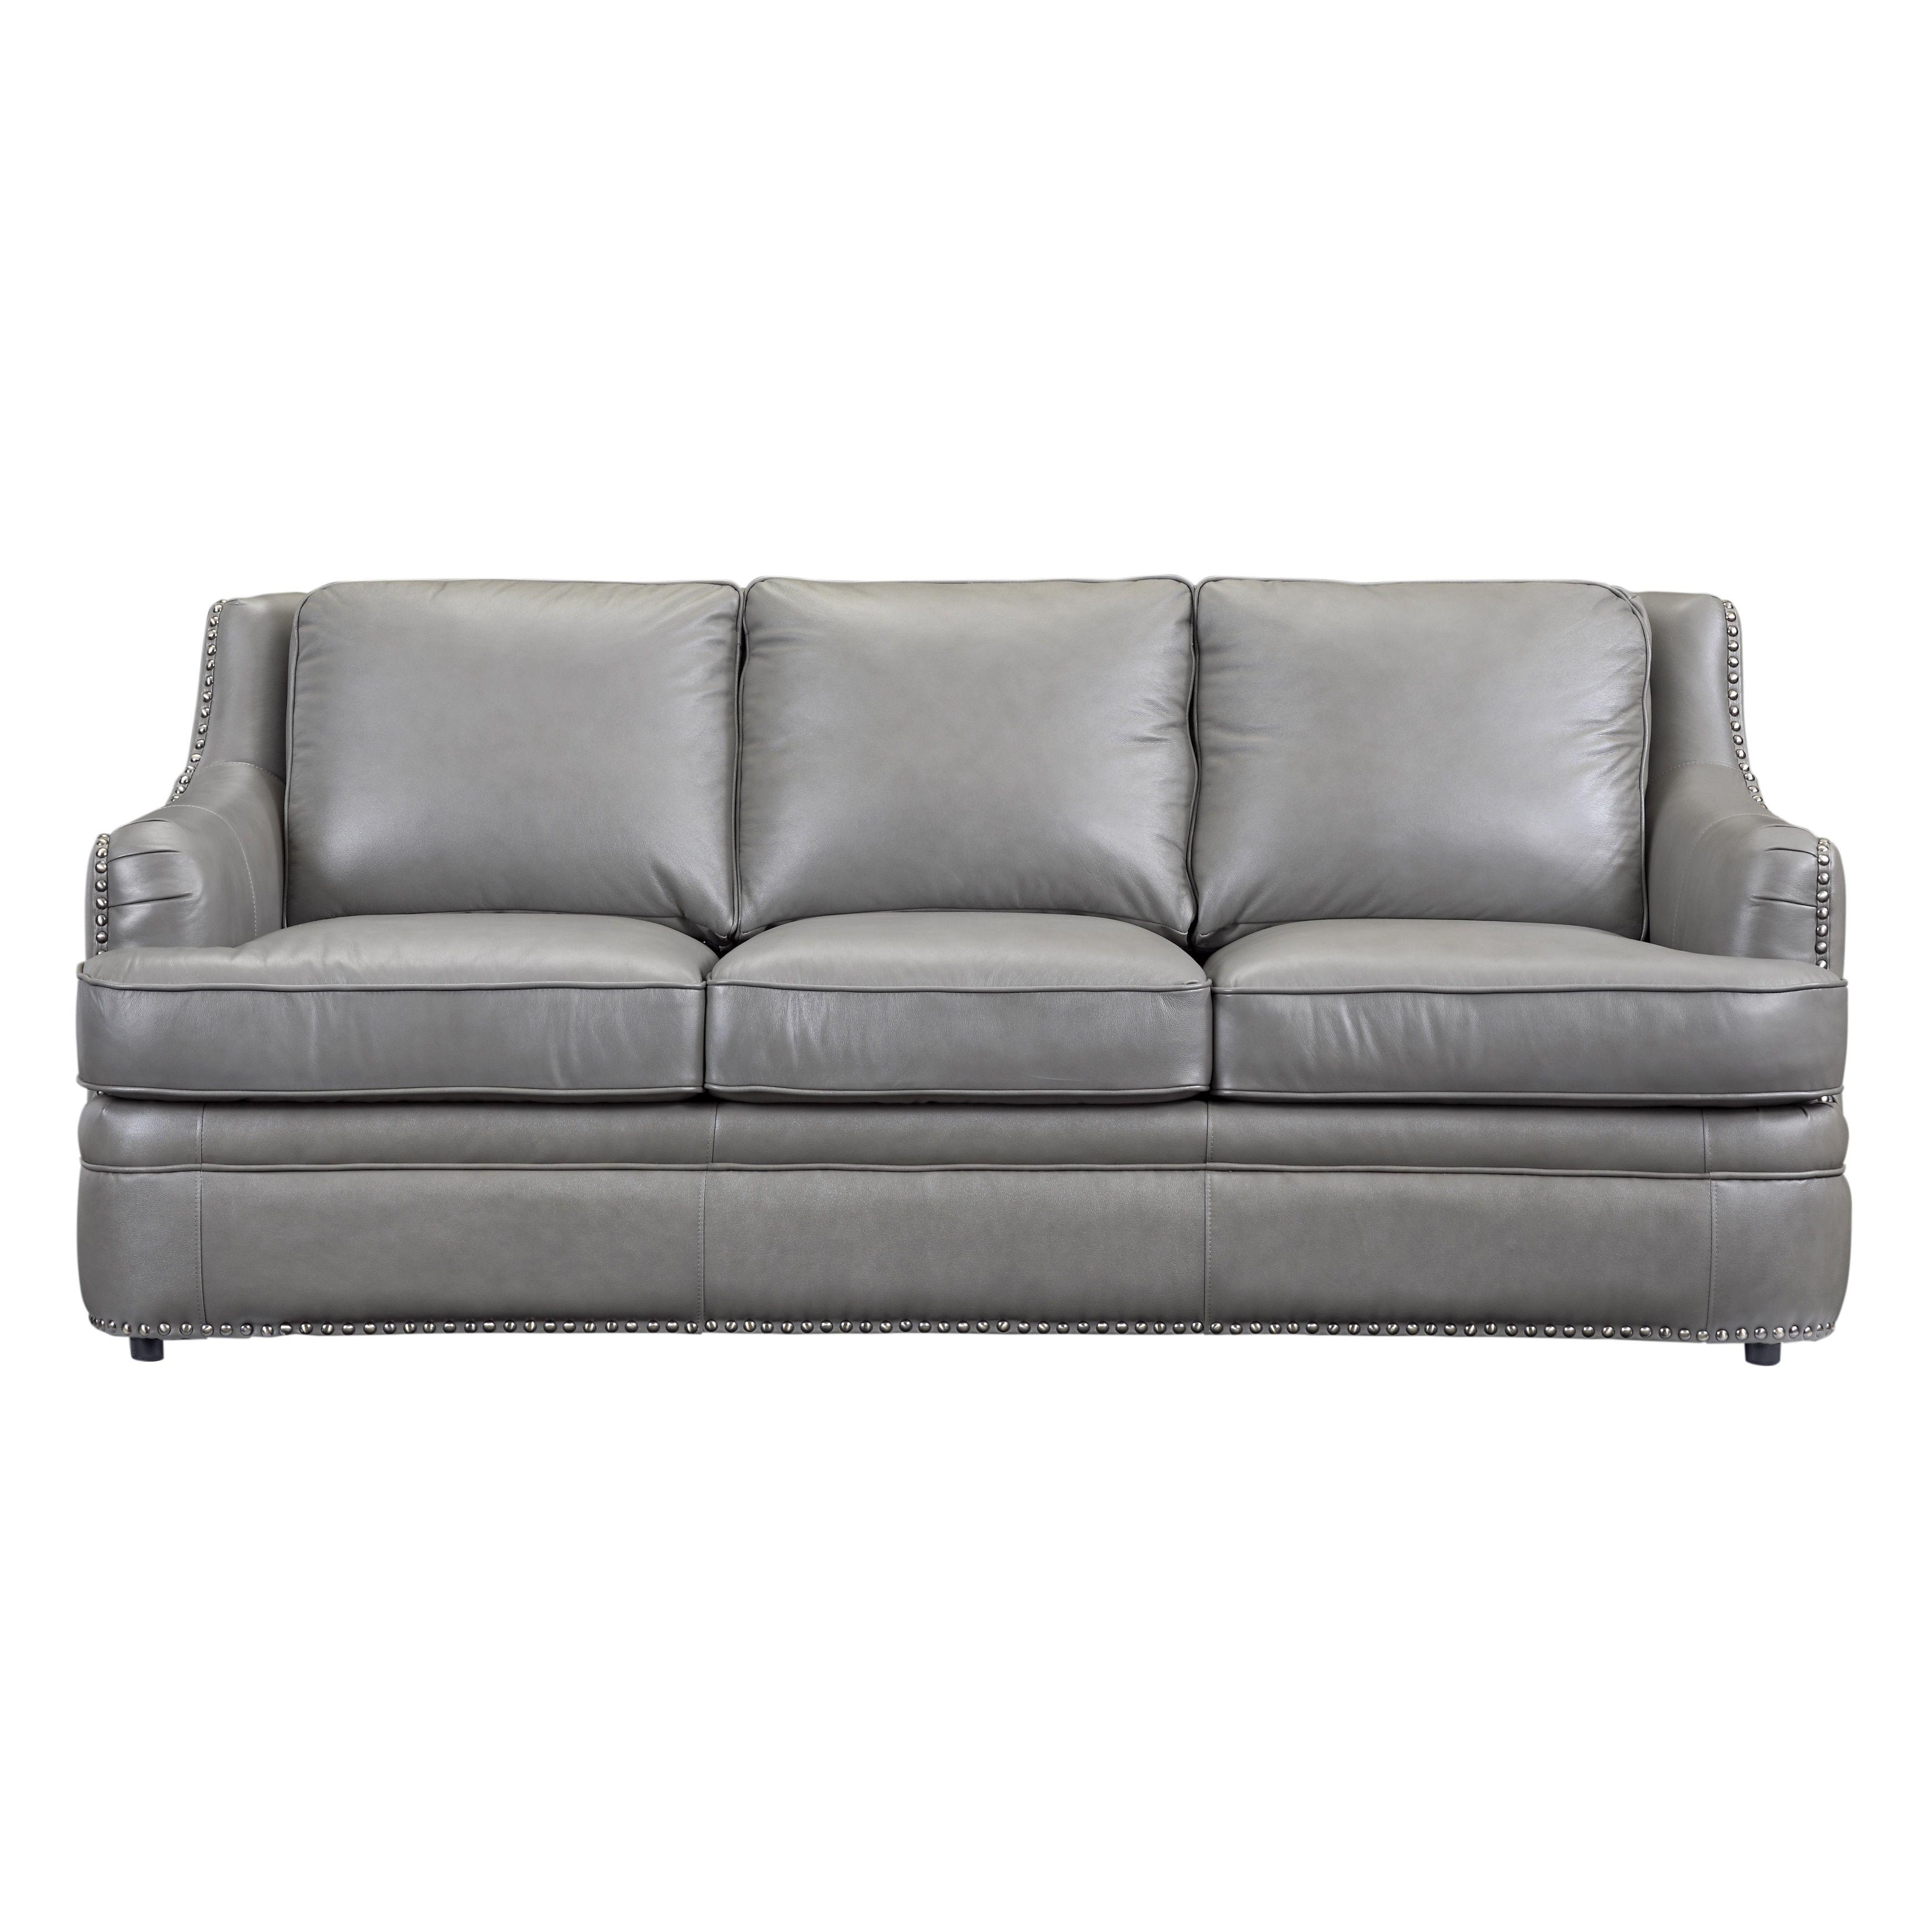 Paris Sofa Furniture Grey Leather Sofa Grey Leather